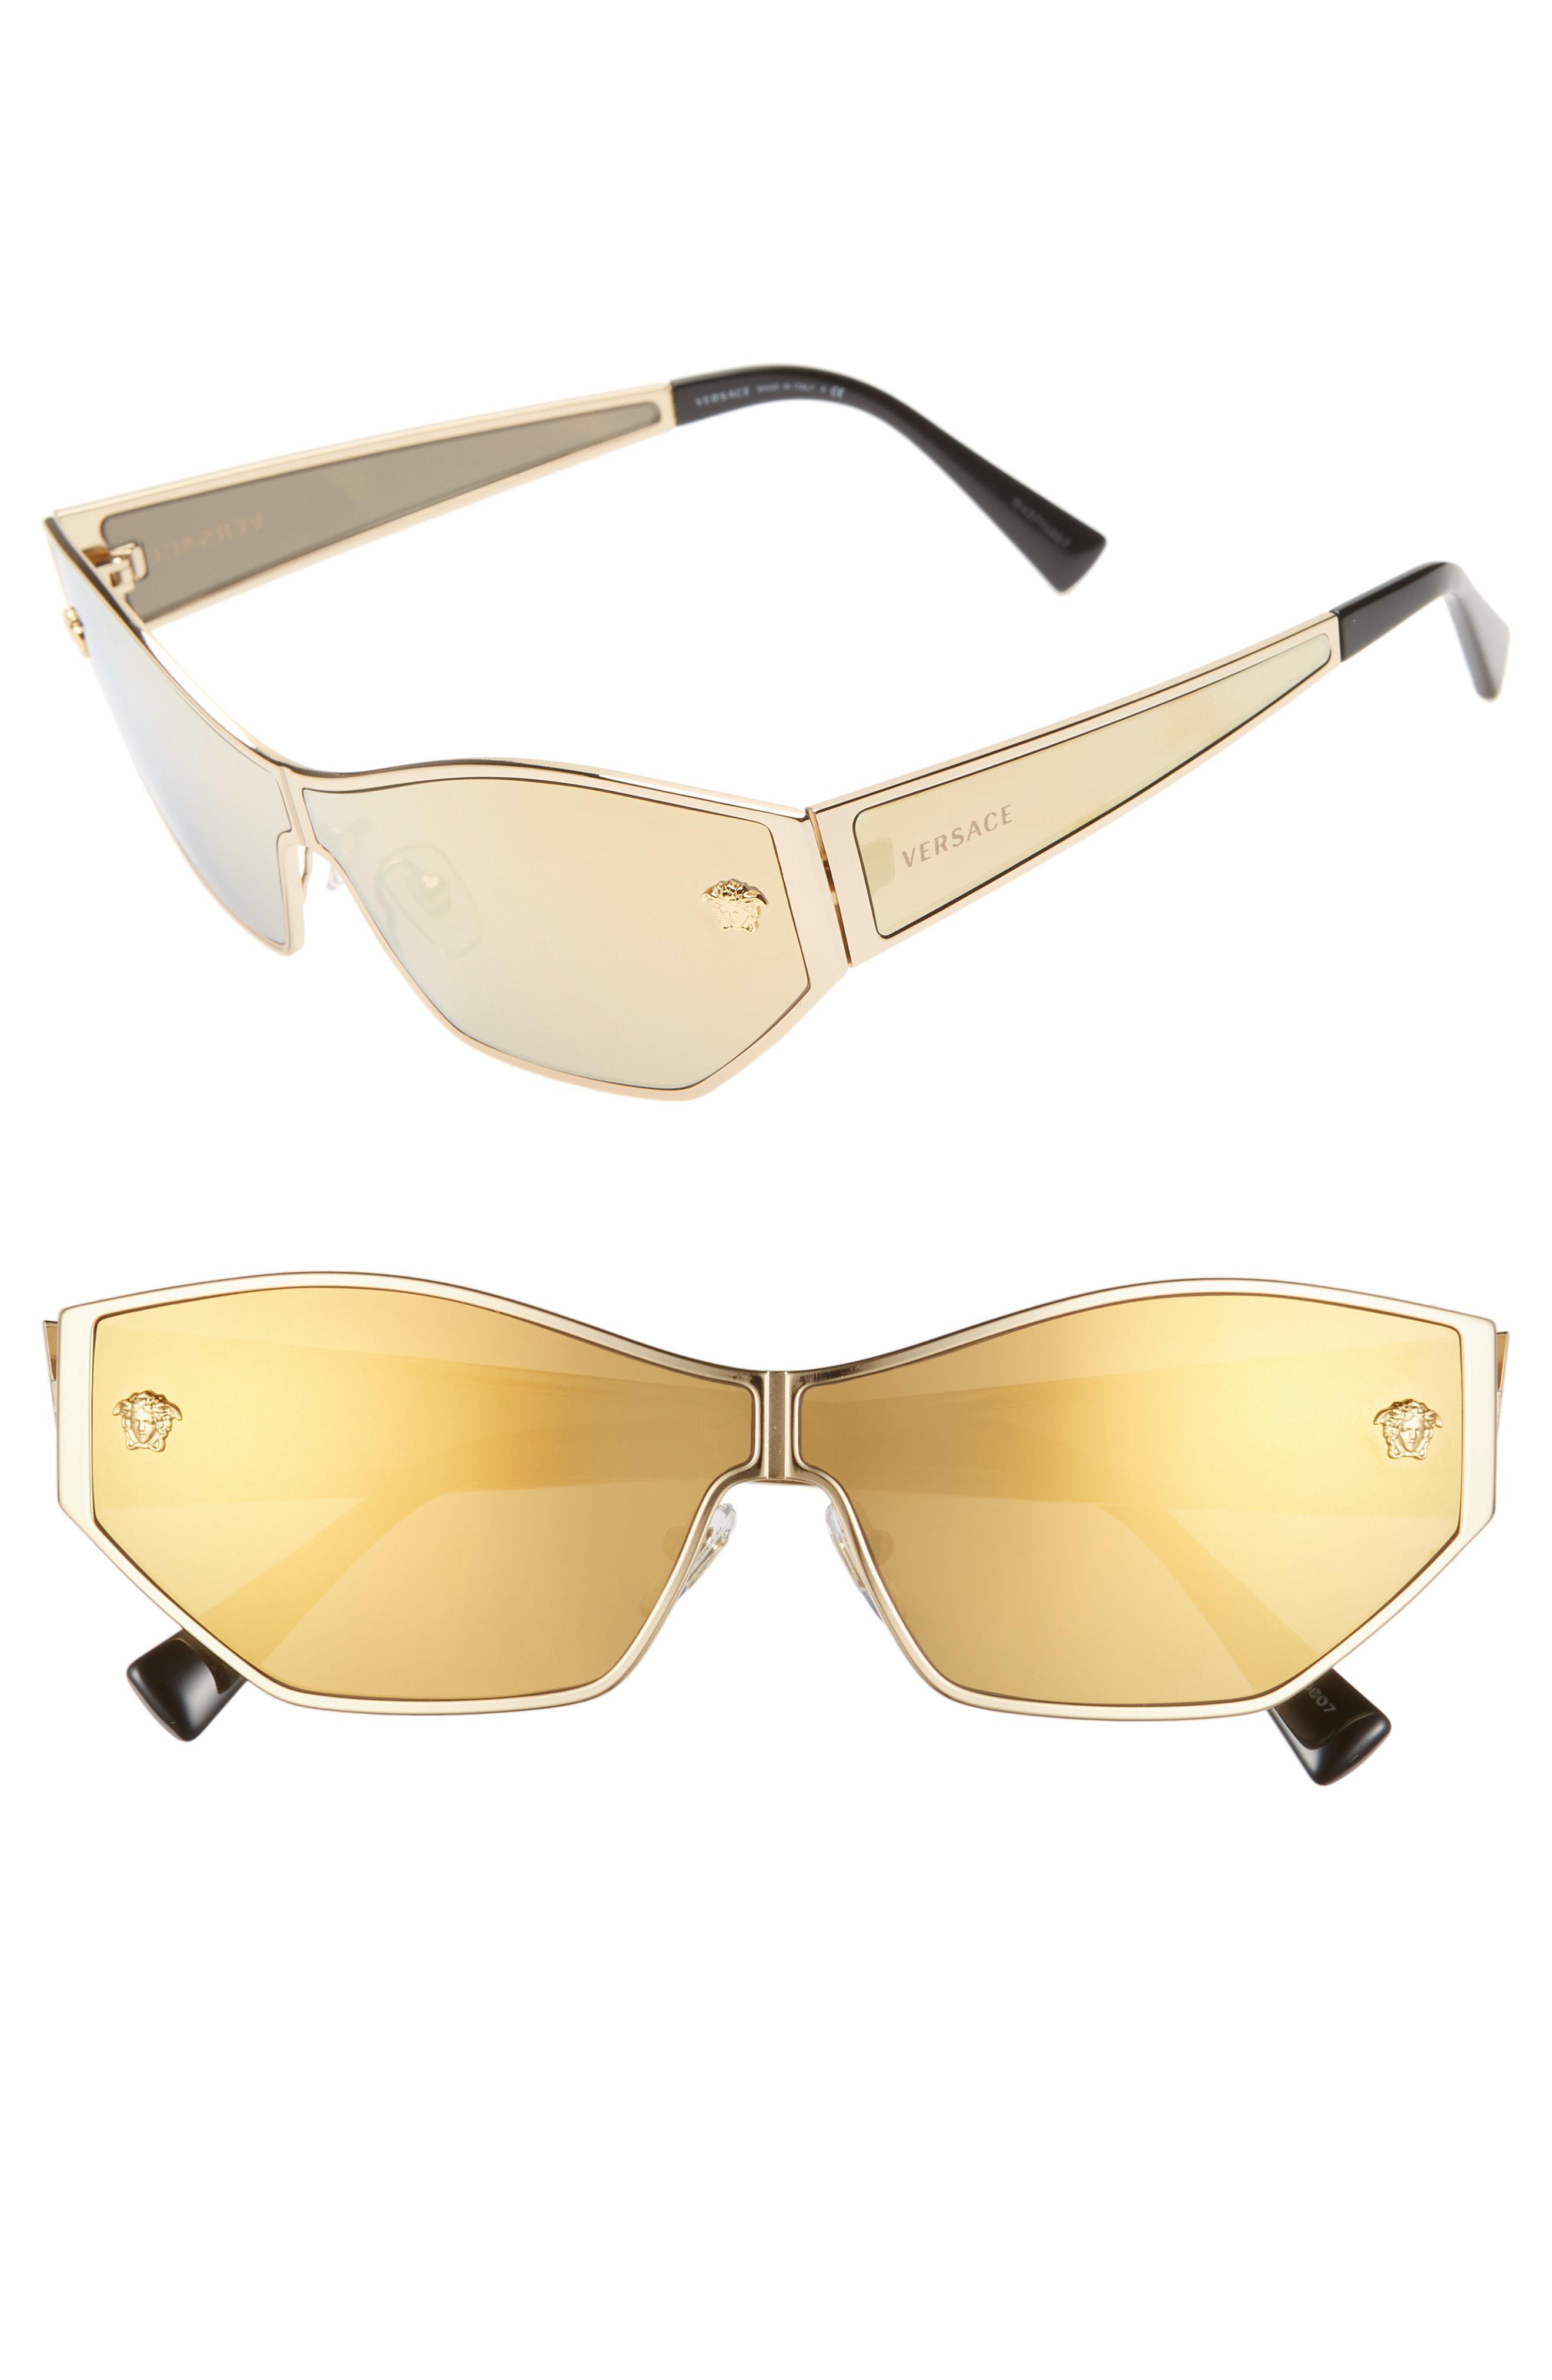 ed6a24ae4cf1b Lyst - Versace 66mm Shield Sunglasses in Metallic